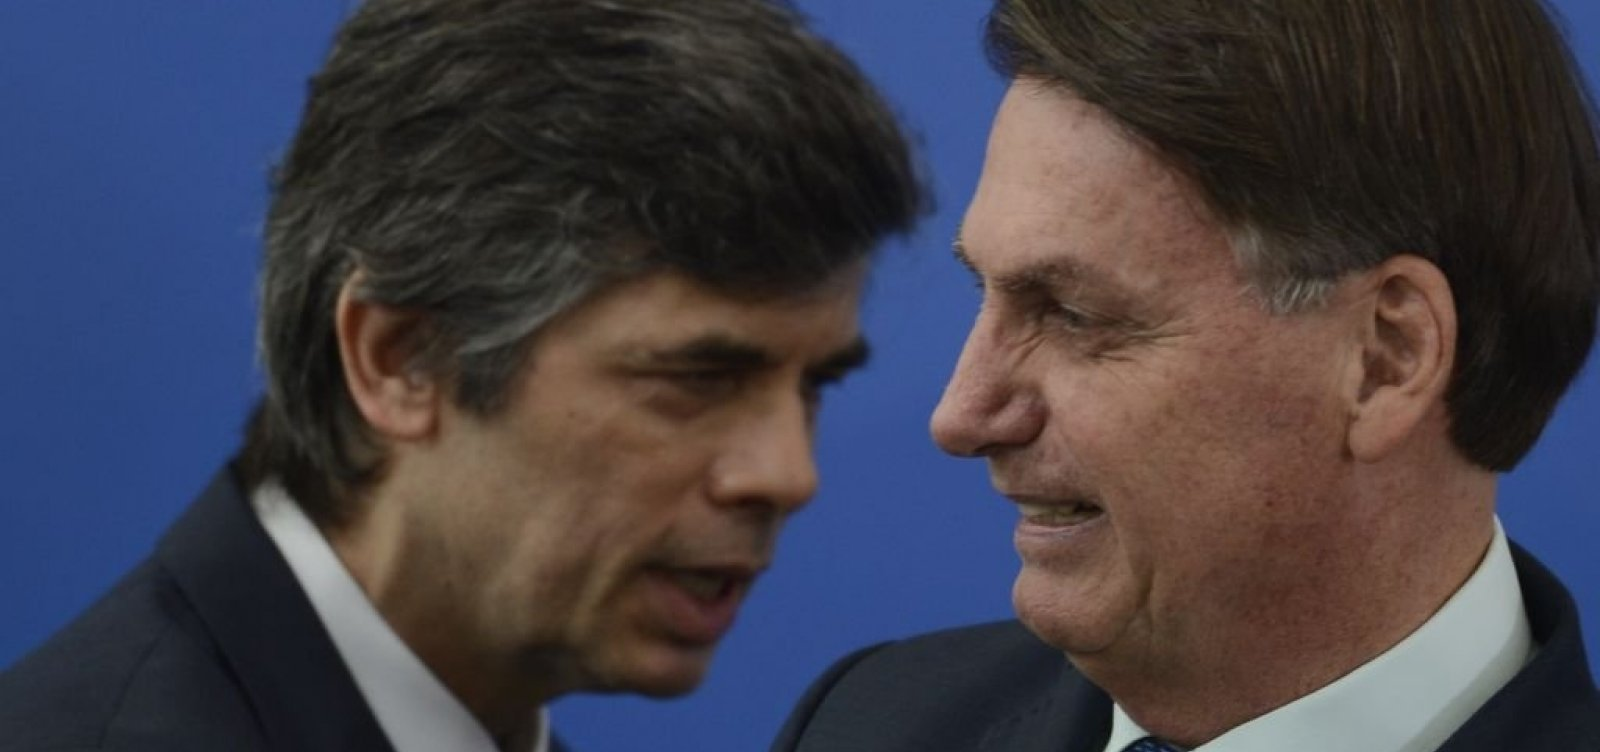 [Bolsonaro convida general para assumir lugar de Teich, se ele se demitir]